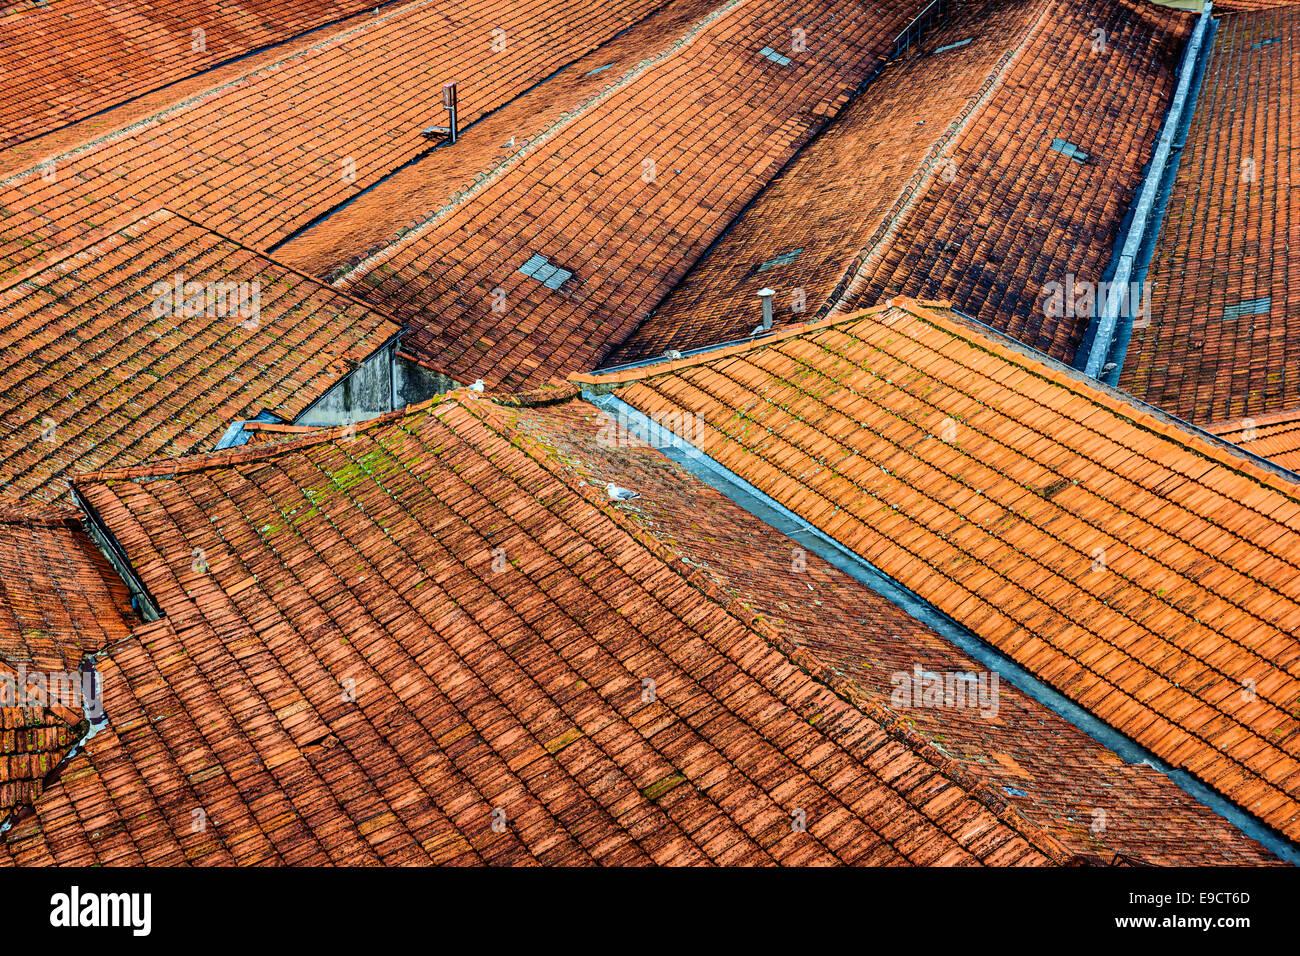 Portuguese rooftops in Porto, Portugal. - Stock Image